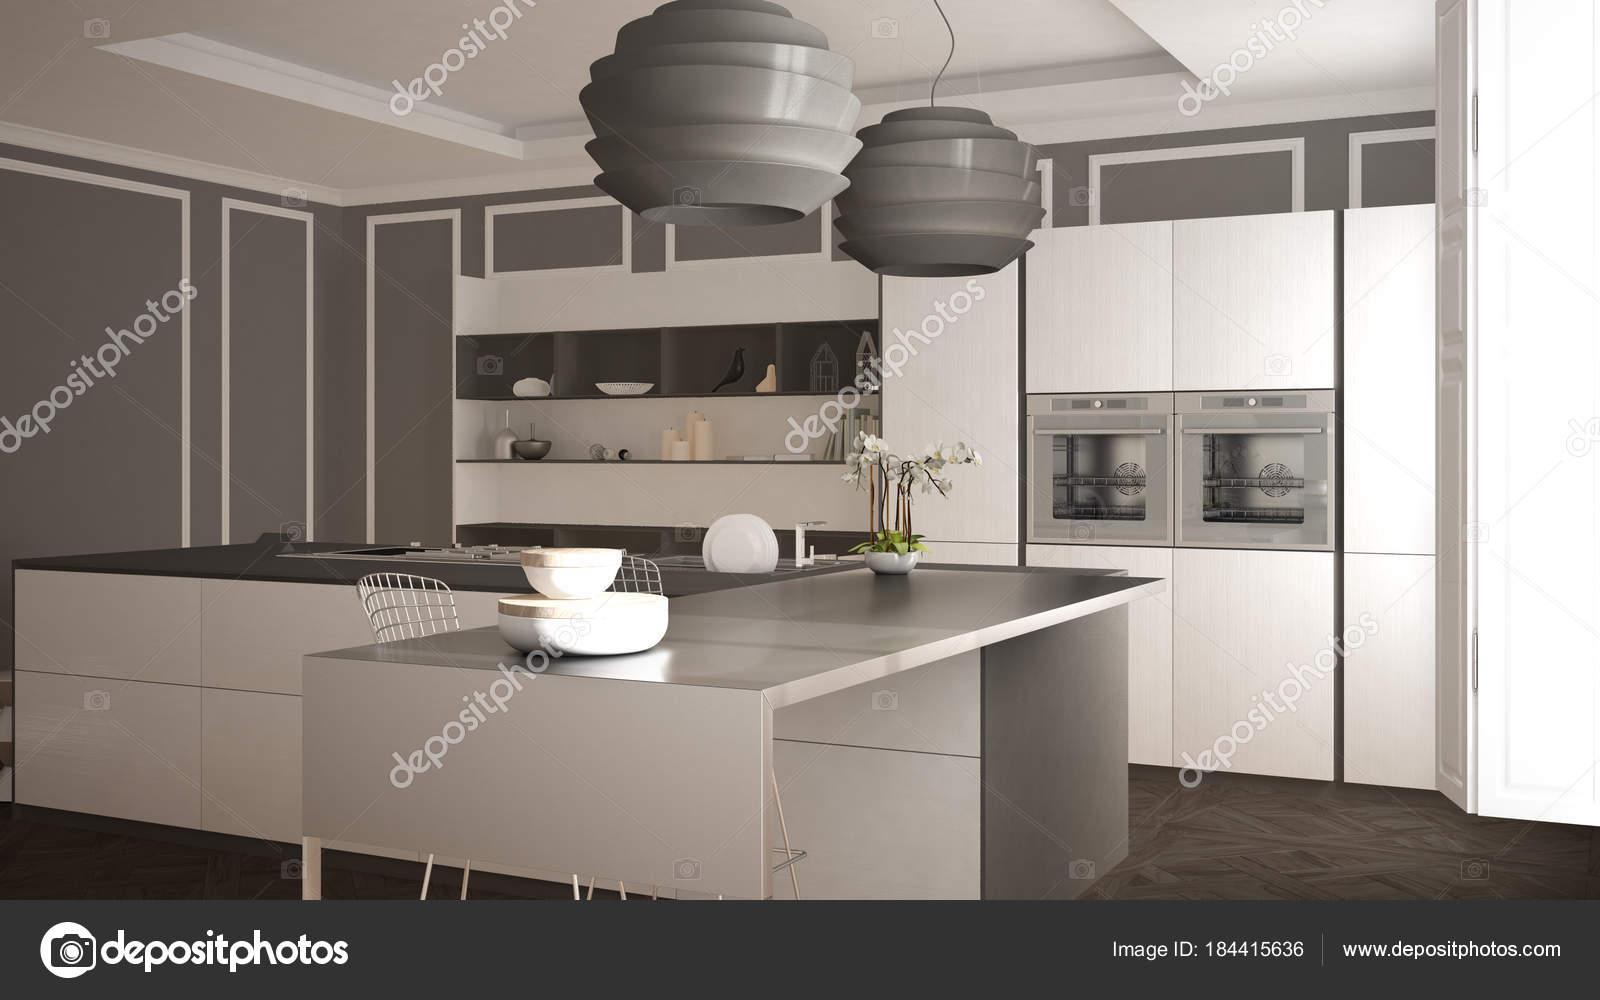 Cucina Moderna Con Sgabelli.Cucina Moderna In Interni Classici Isola Con Sgabelli E Due